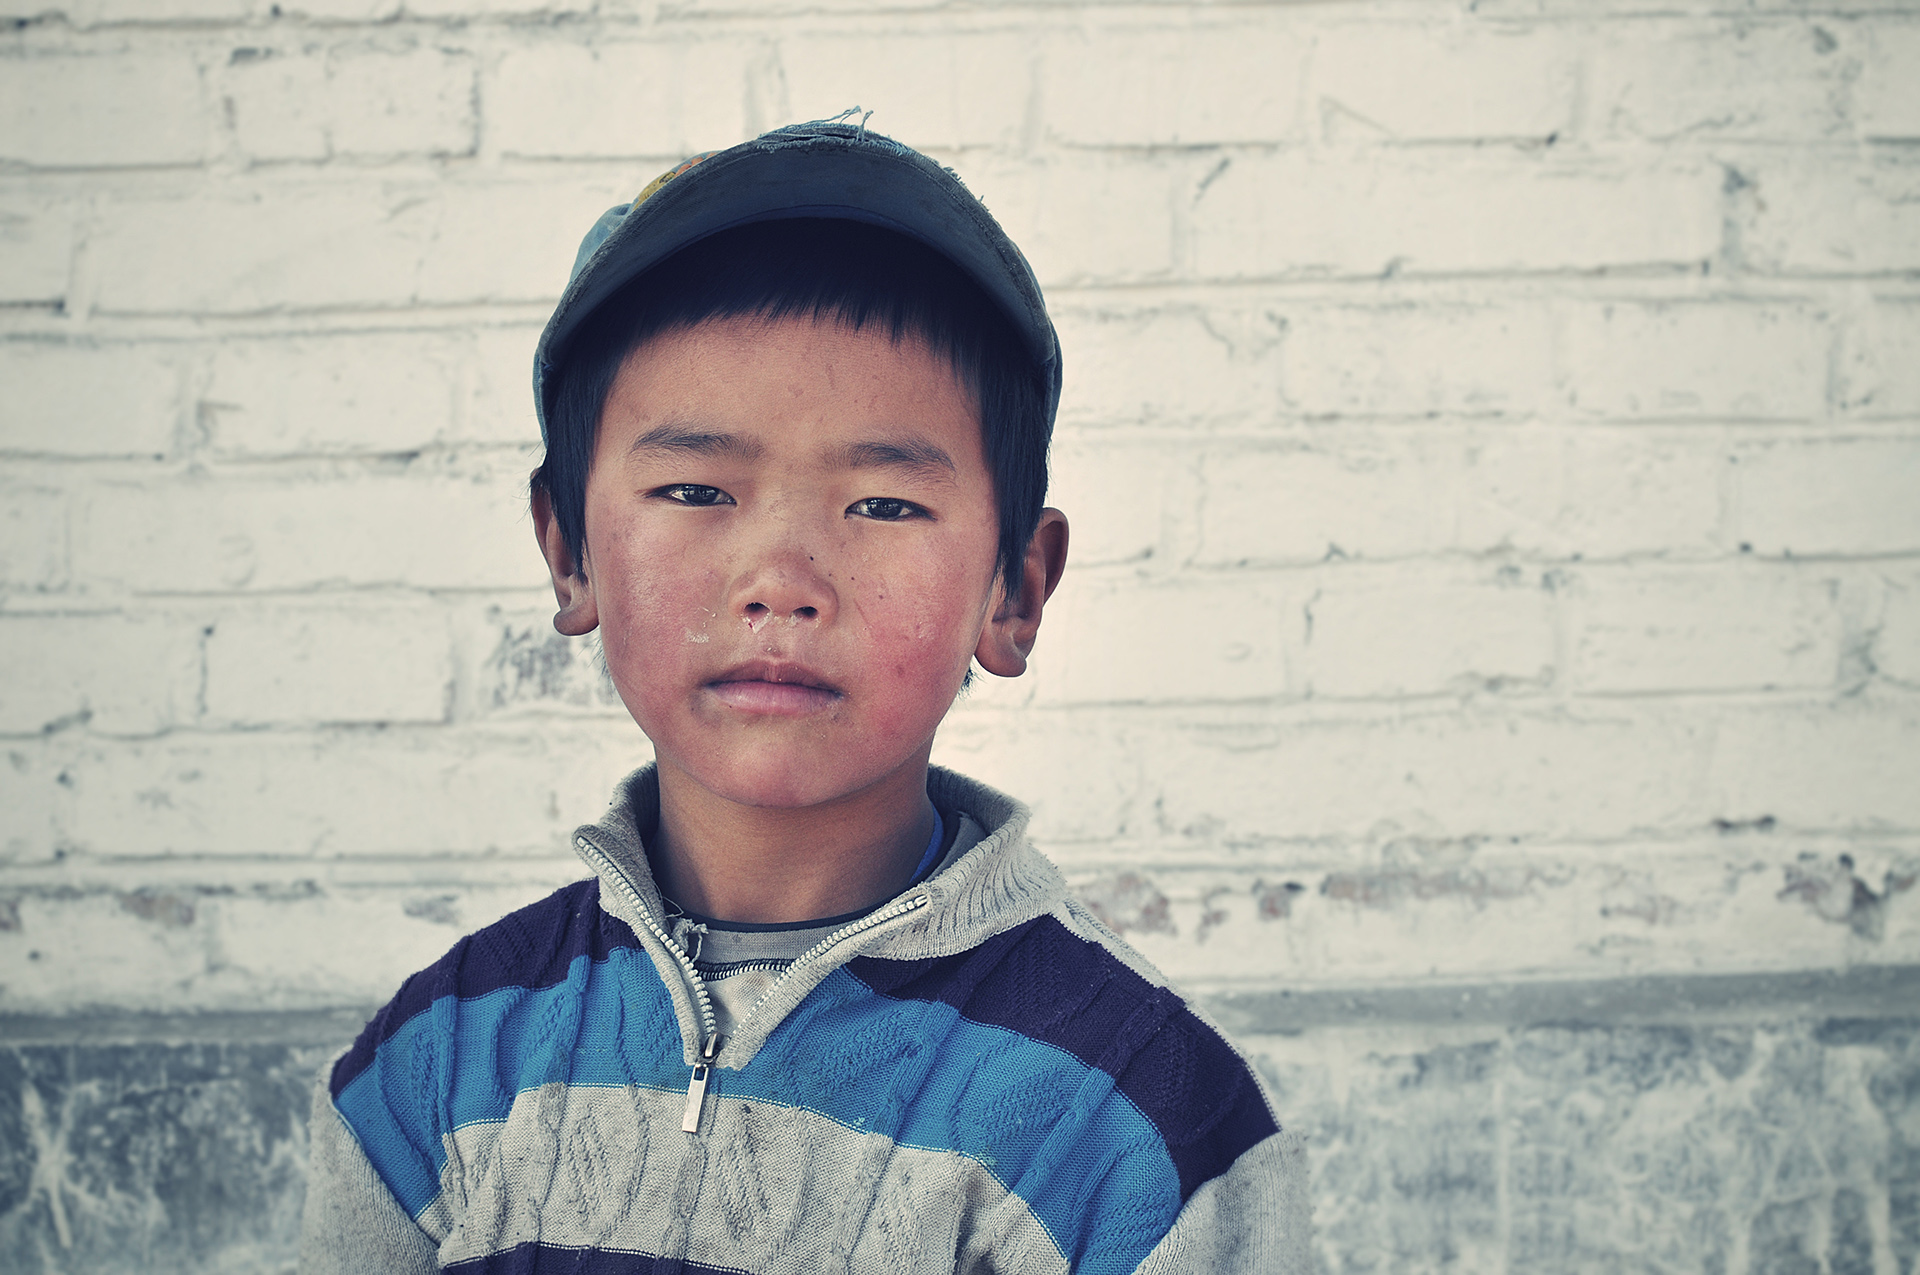 young-tibetan-amdo-boy-snot.jpg